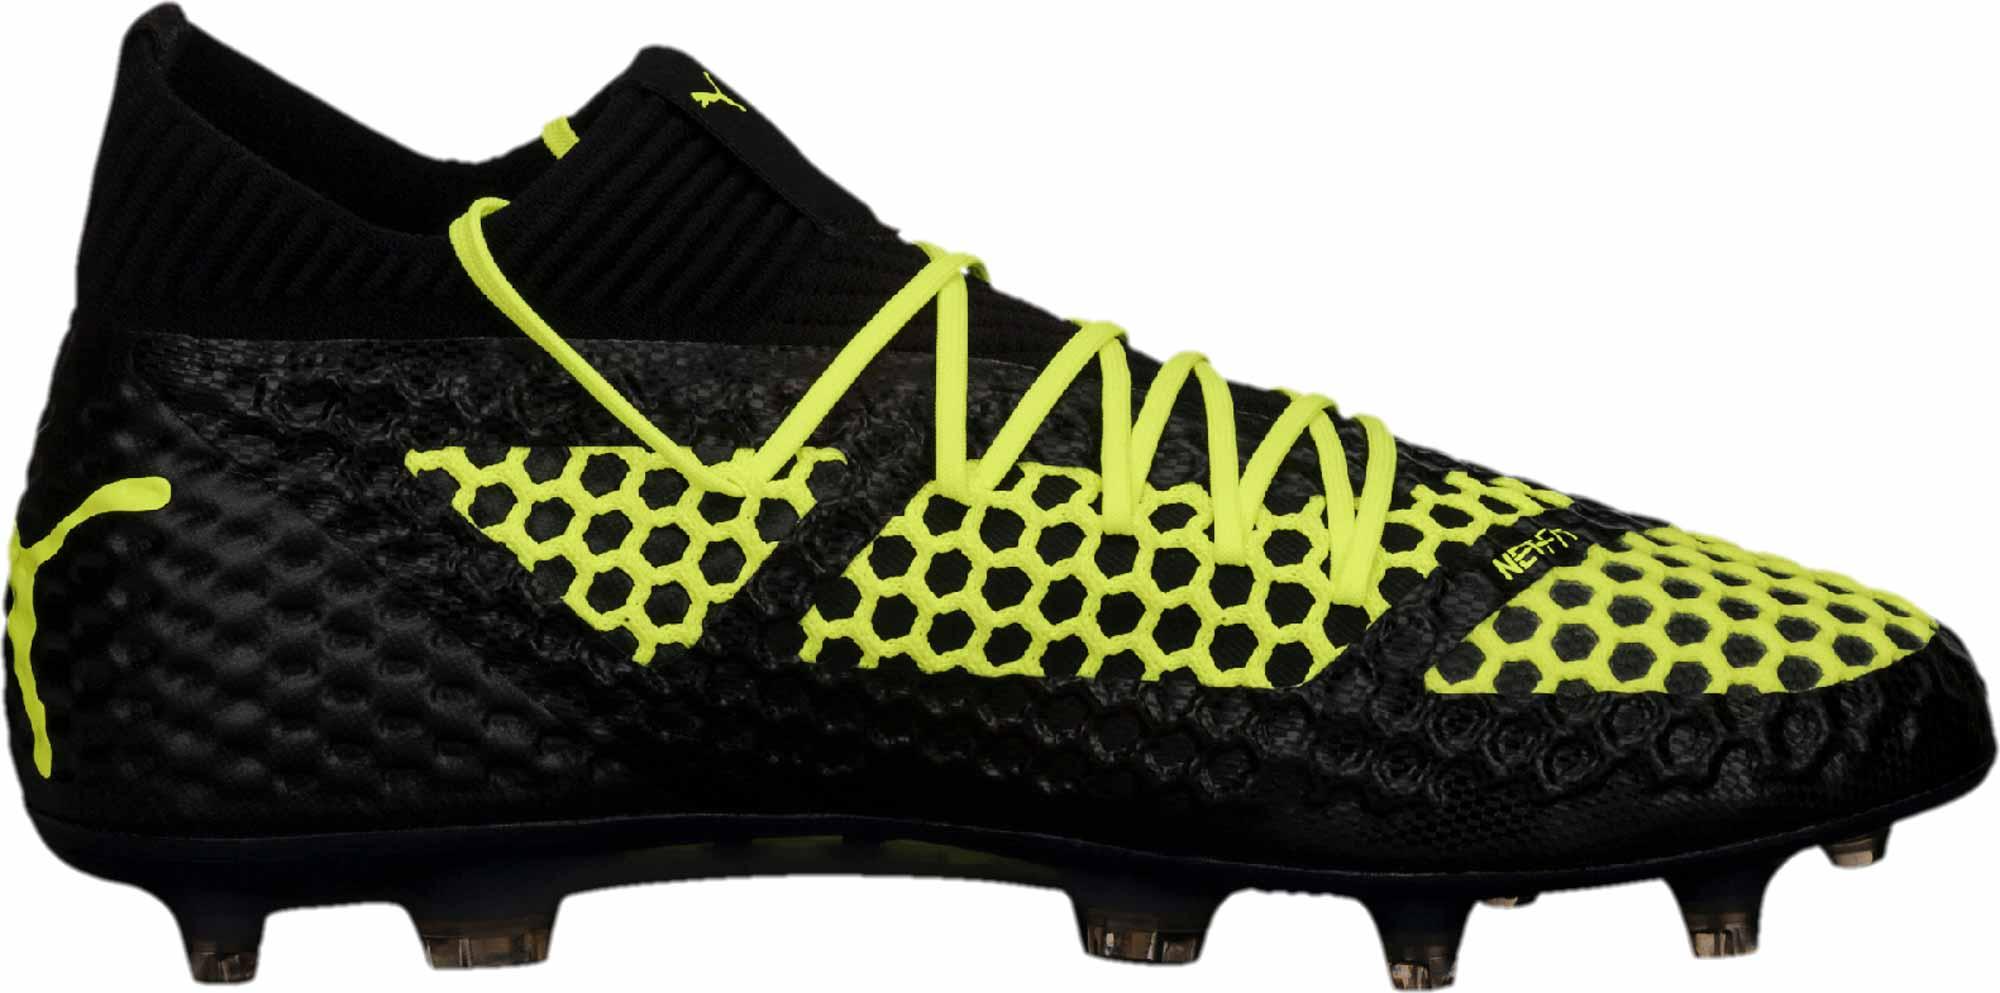 8f7067520a5 PUMA Future 18.1 Netfit FG - LE - Black Fizzy Yellow - SoccerPro